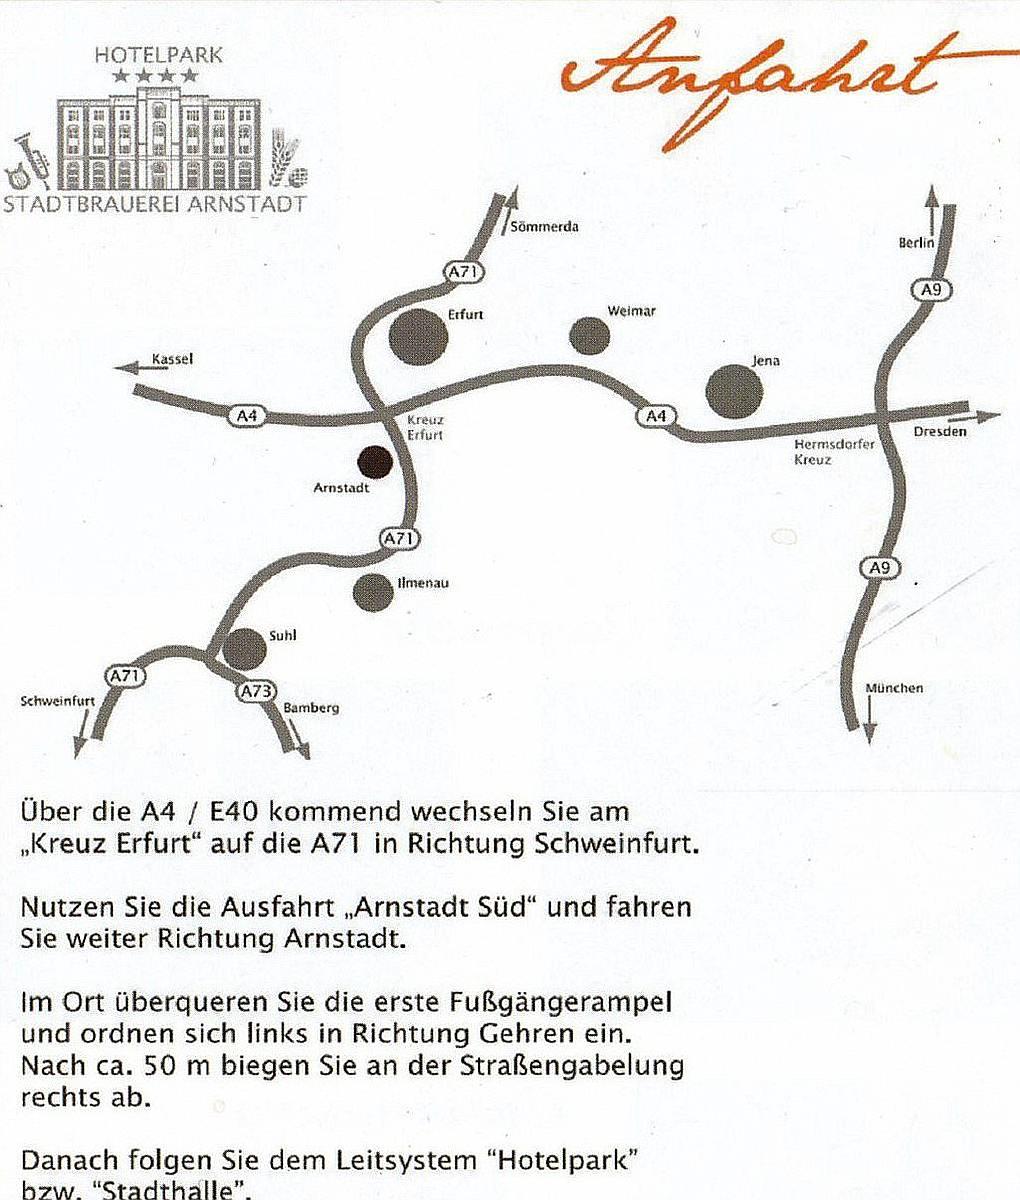 PMC-Thüringen-2020-1 Modellbauausstellung des PMC Thüringen 16./17. Mai 2020